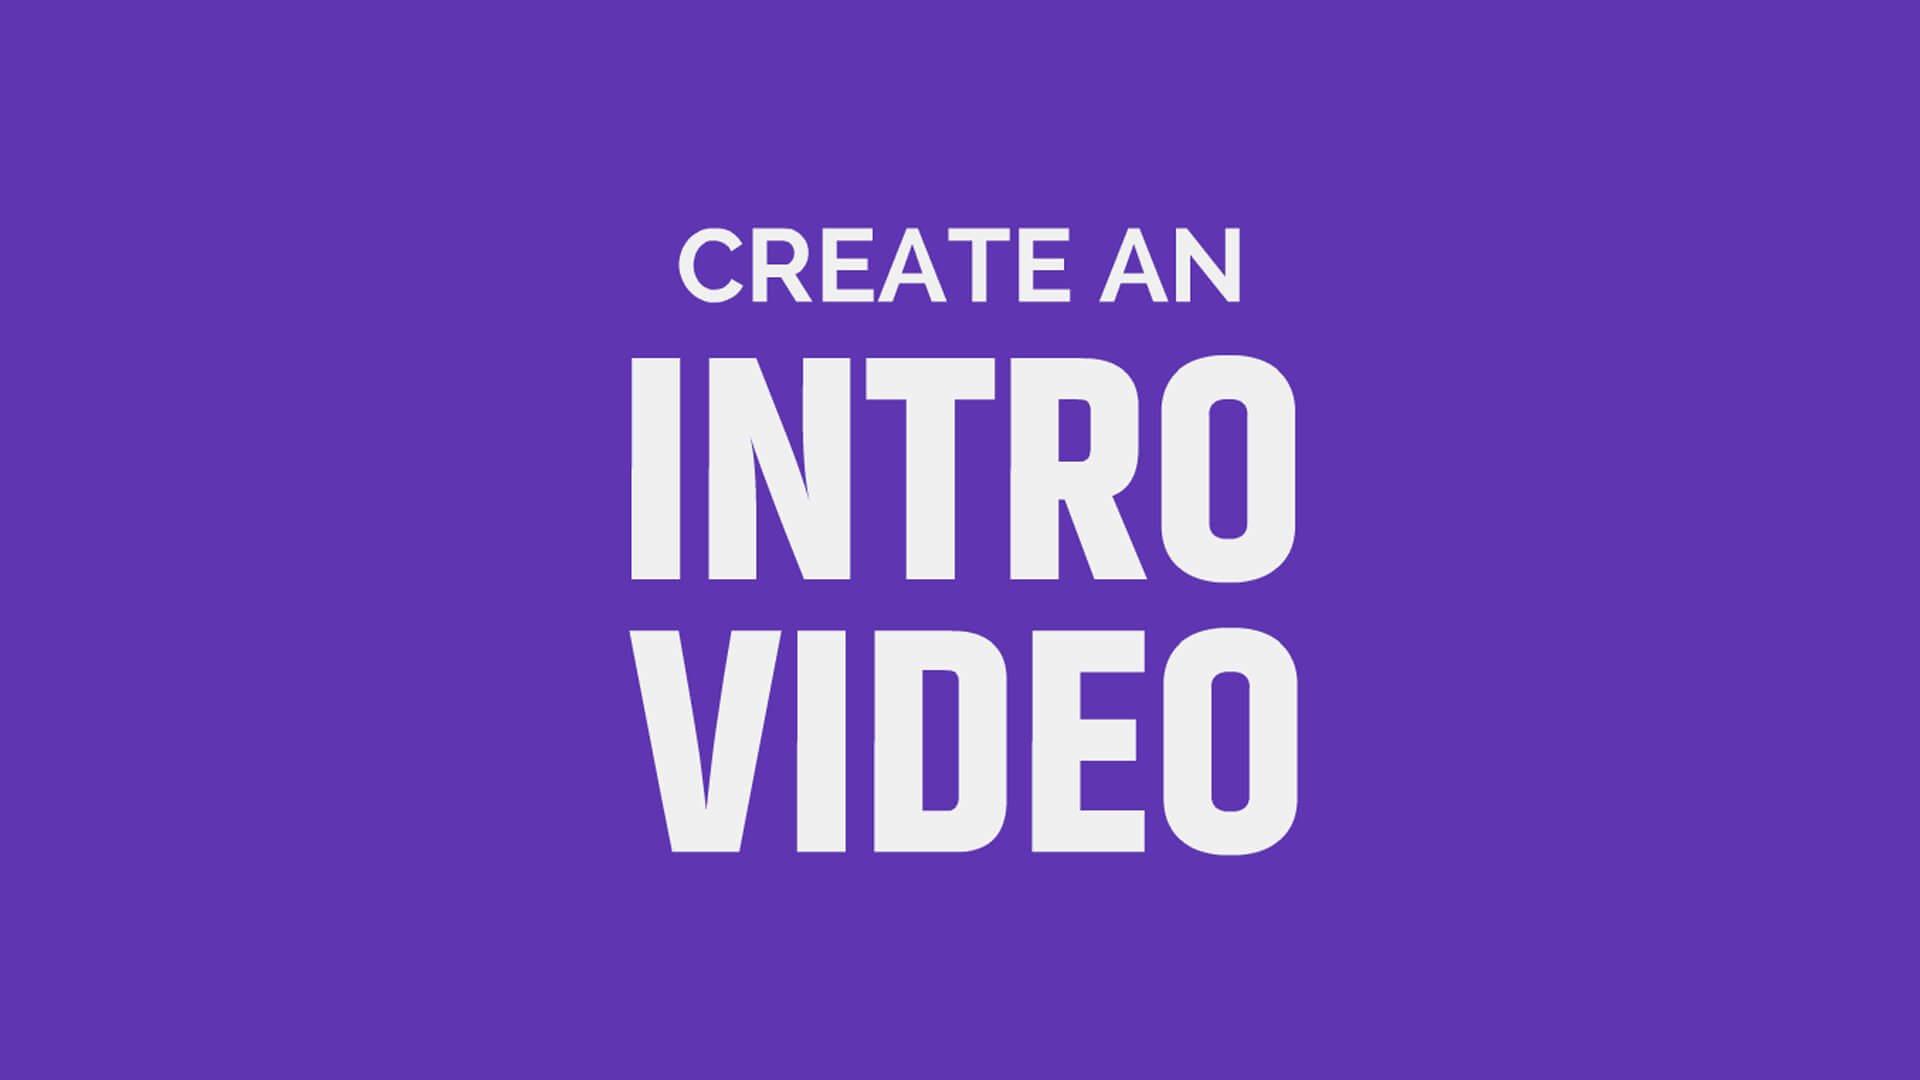 create an intro video